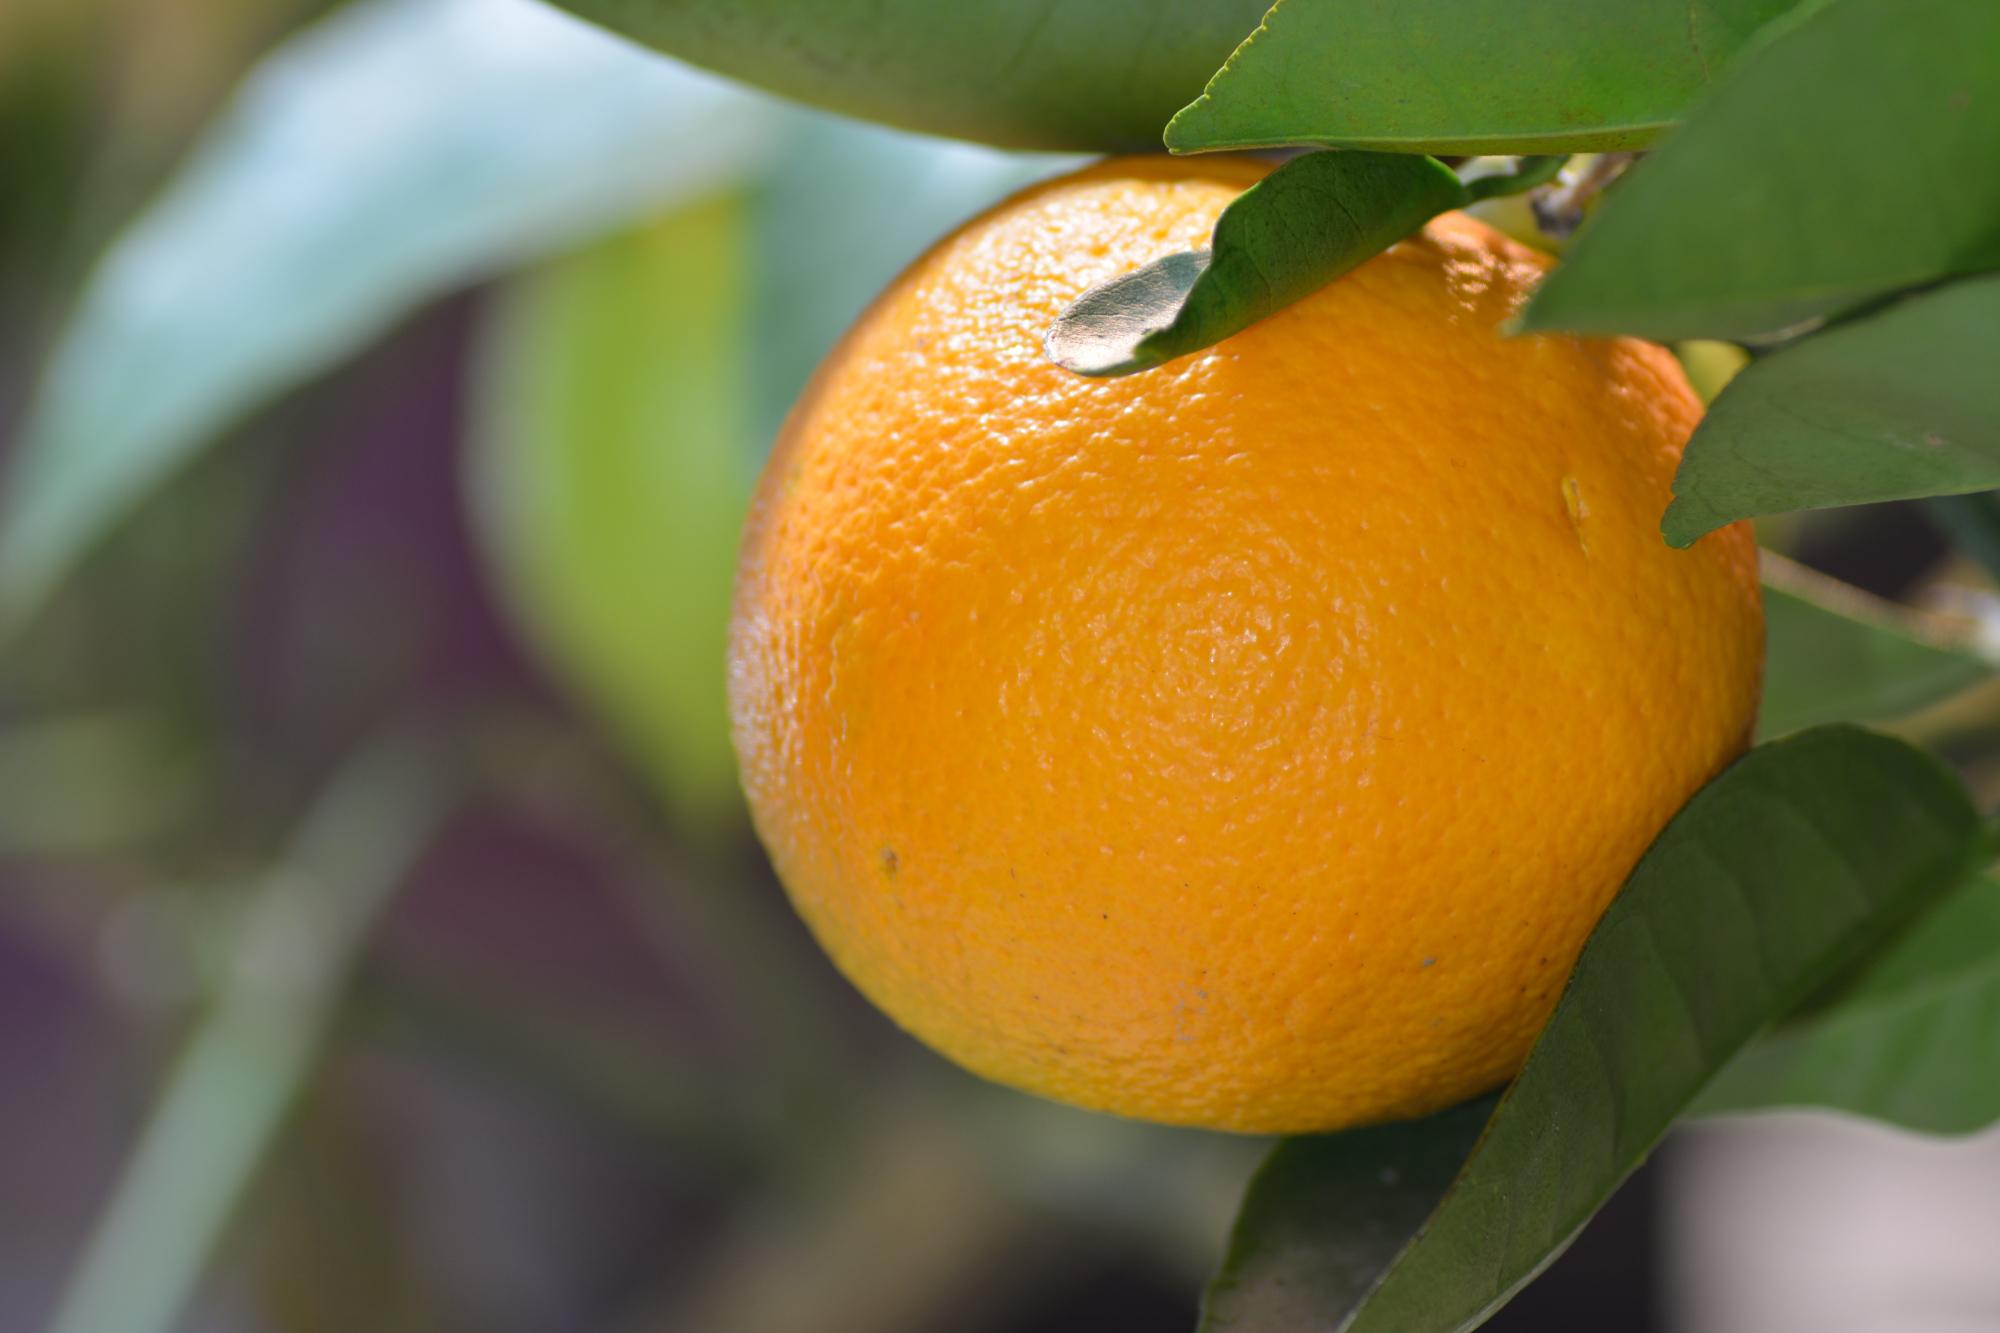 Appelsiinipuu on uusin tulokas putarhassa!